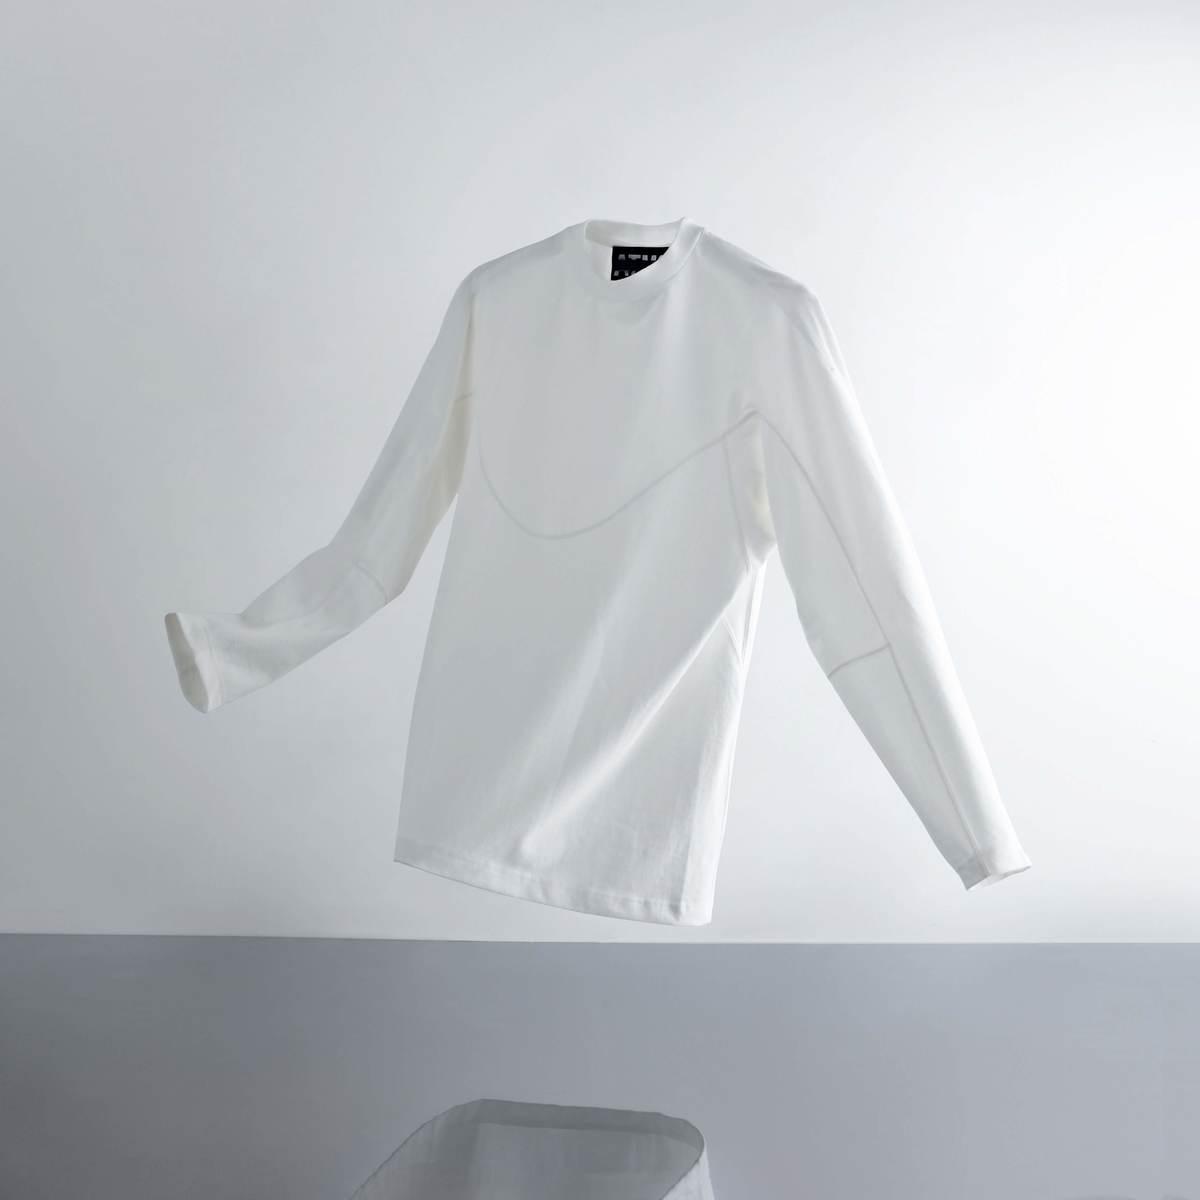 A-GIRLS ATMOS Pinnacle Long Sleeve Line Tee (エイガールズ アトモス ピナクル ロングスリーブ ティーシャツ) WHITE【メンズ Tシャツ】19SS-S